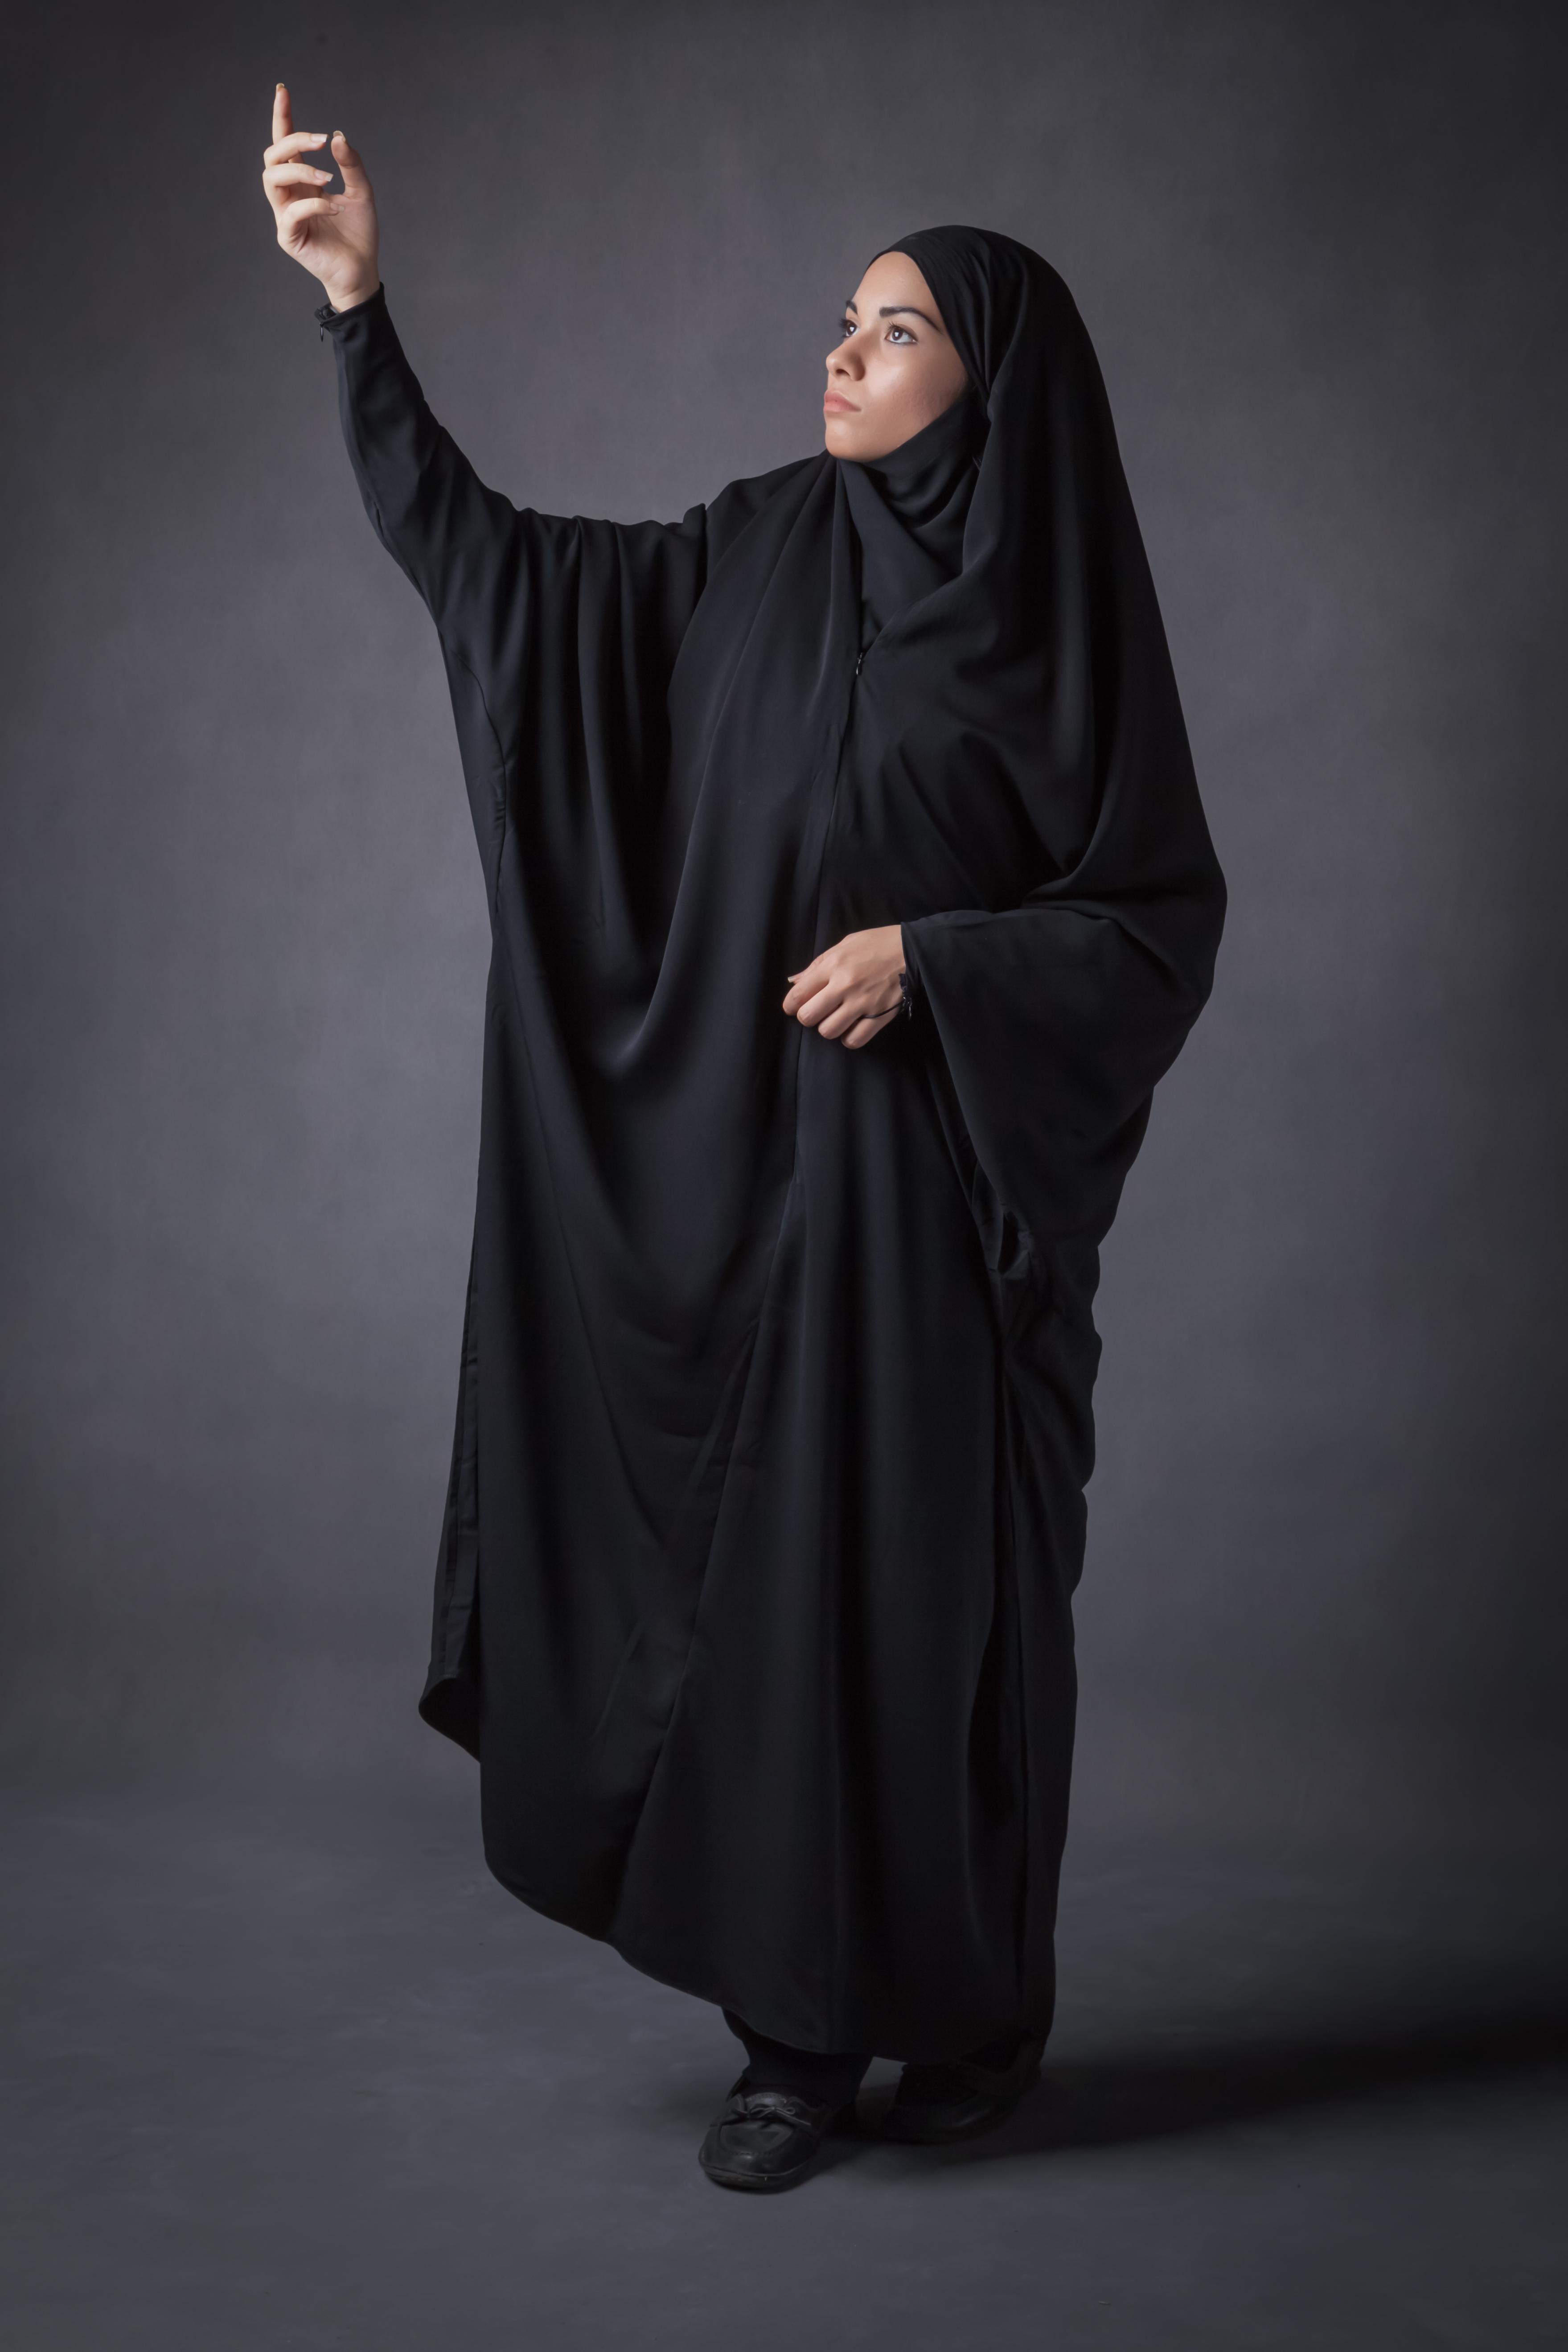 حجاب کرپ کن کن (جلابیب)